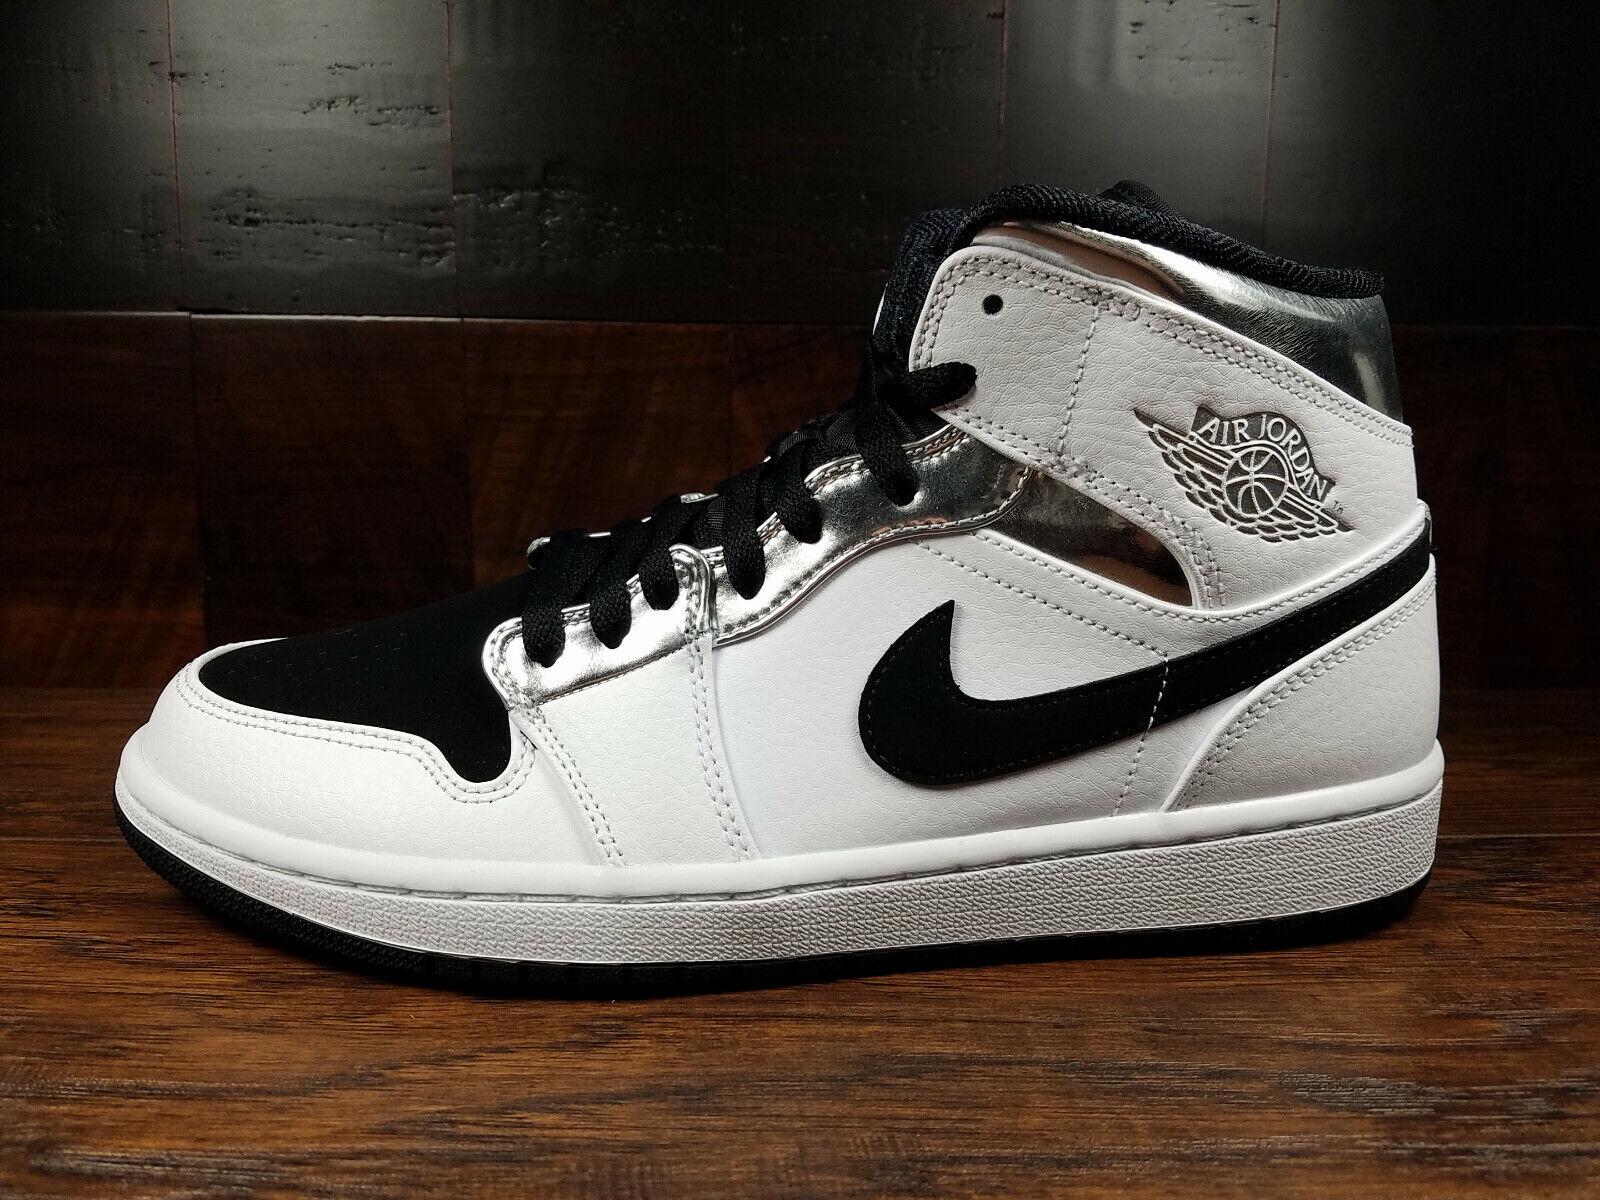 Air Jordan 1 Mid - Alternate Kawhi Think 16 (White Metallic Silver)